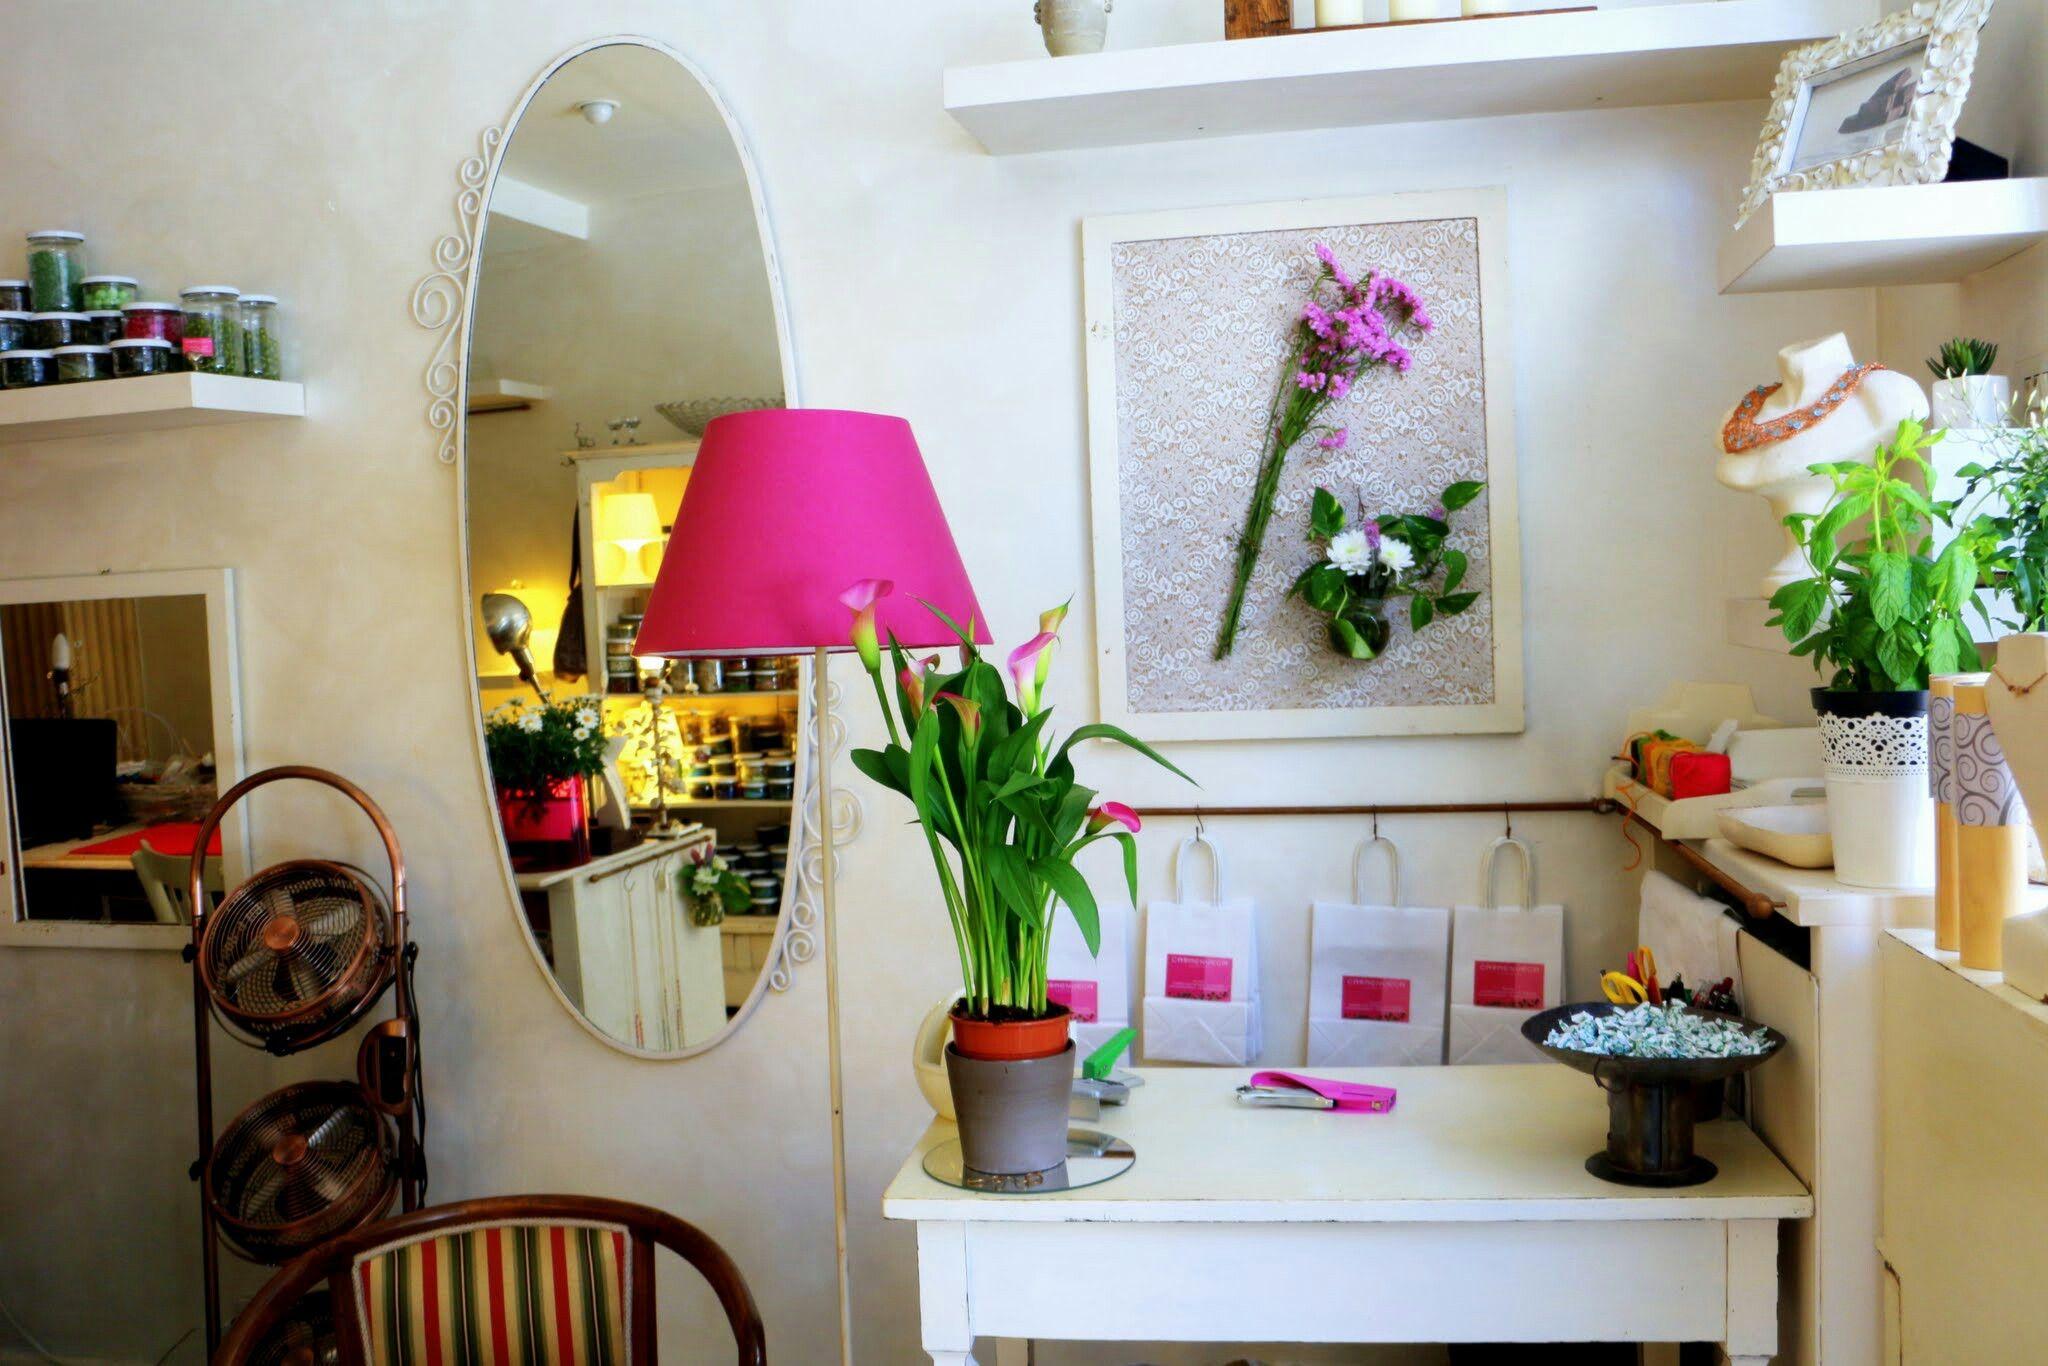 Shop via Savona 1 Milano #bijoux #handmadejewellery #handemade #viasavona1